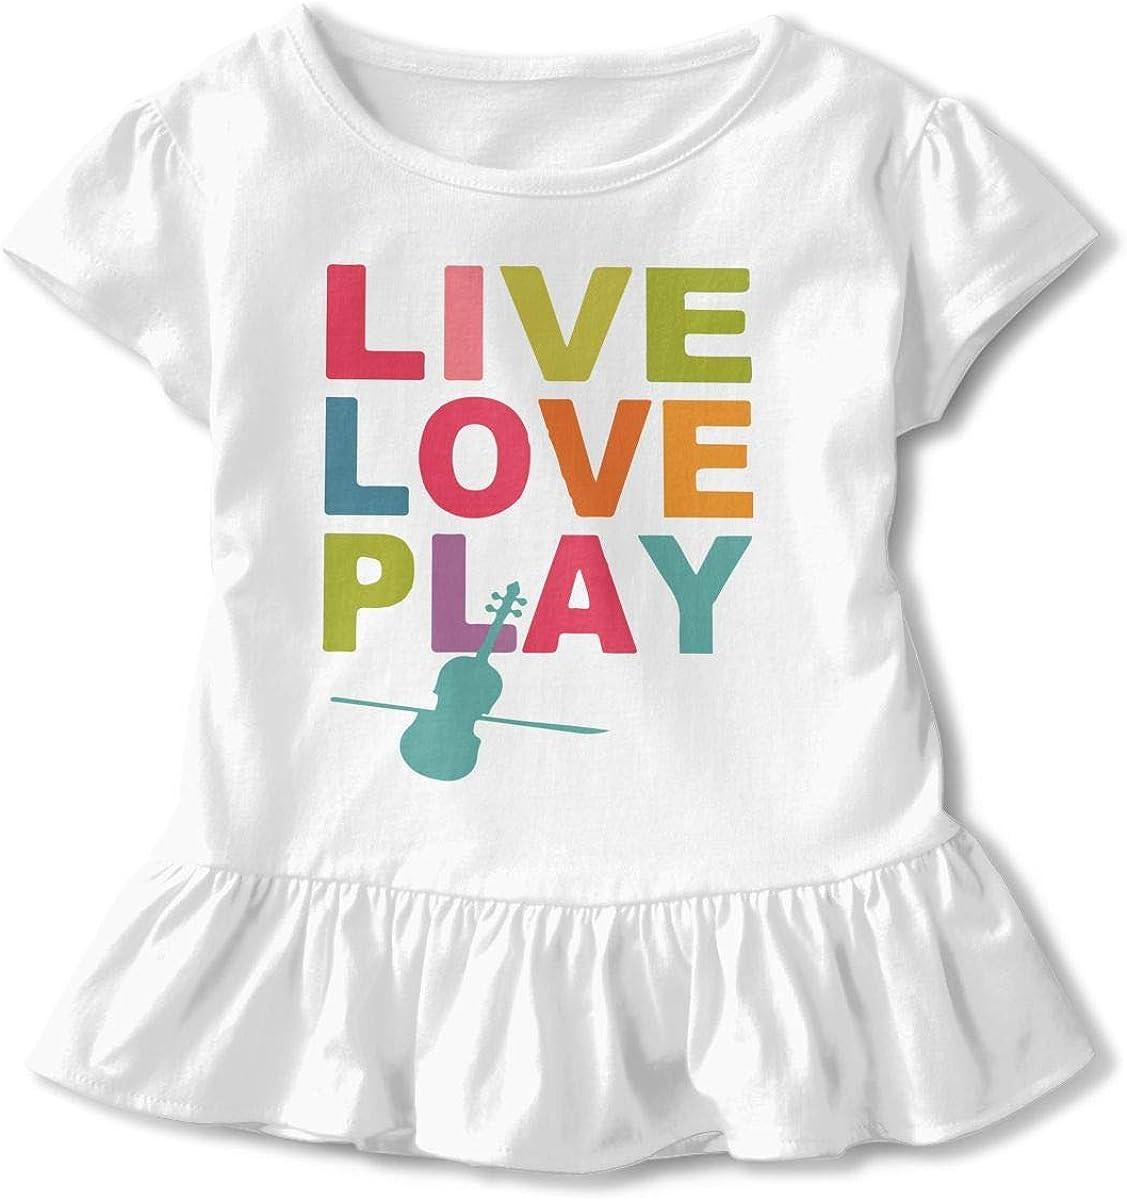 Live Love Play Kids Children Crew Neck T-Shirt Top/&Tee